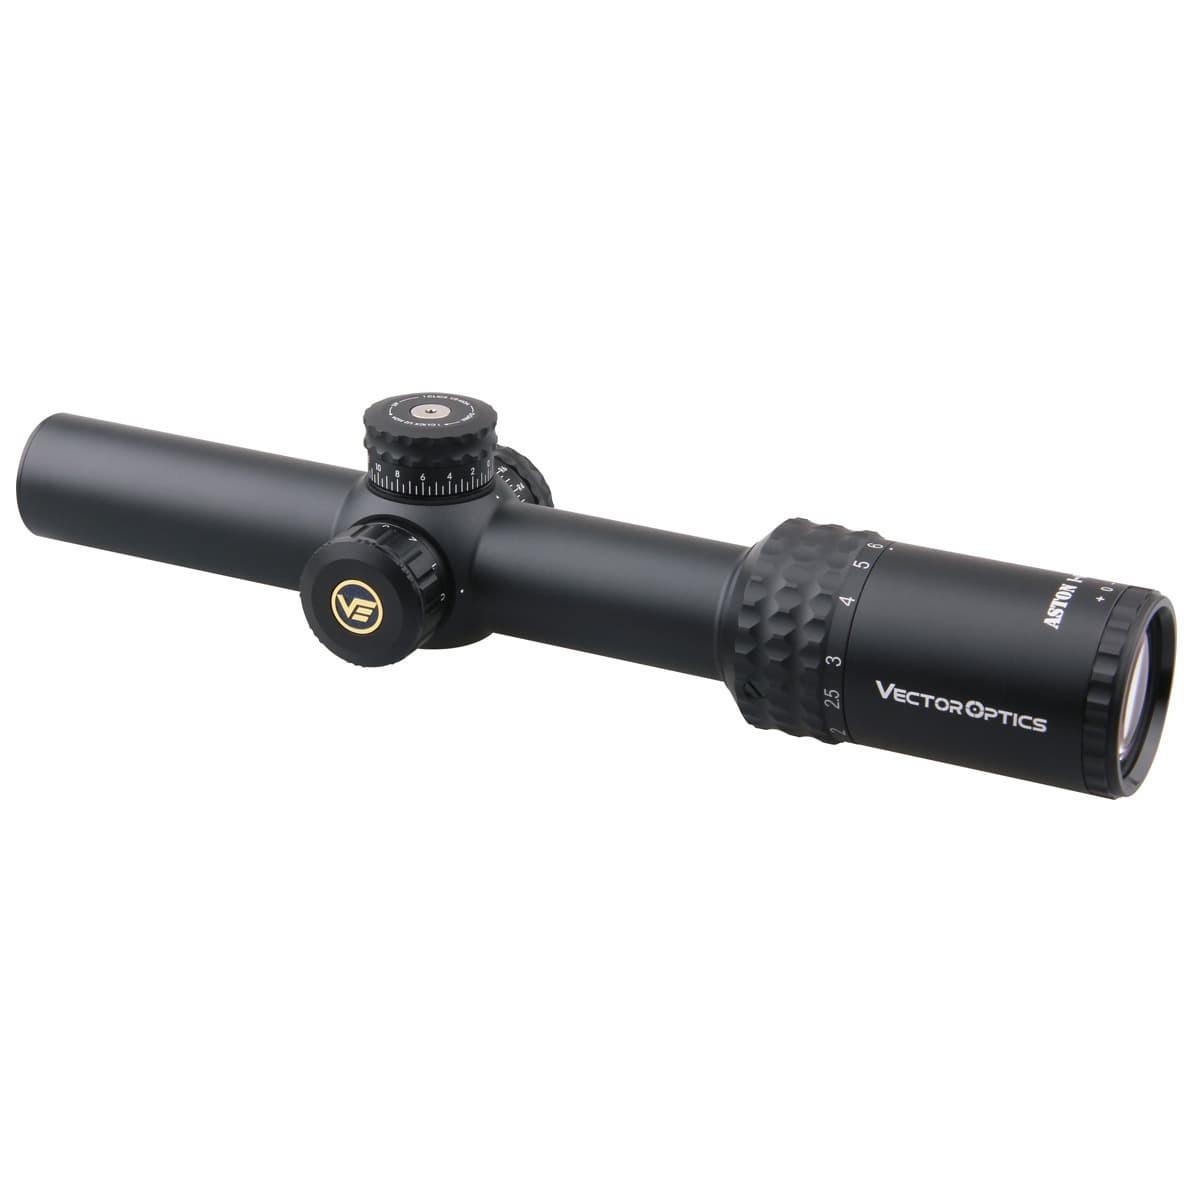 Aston 1-6x24SFP Riflescope